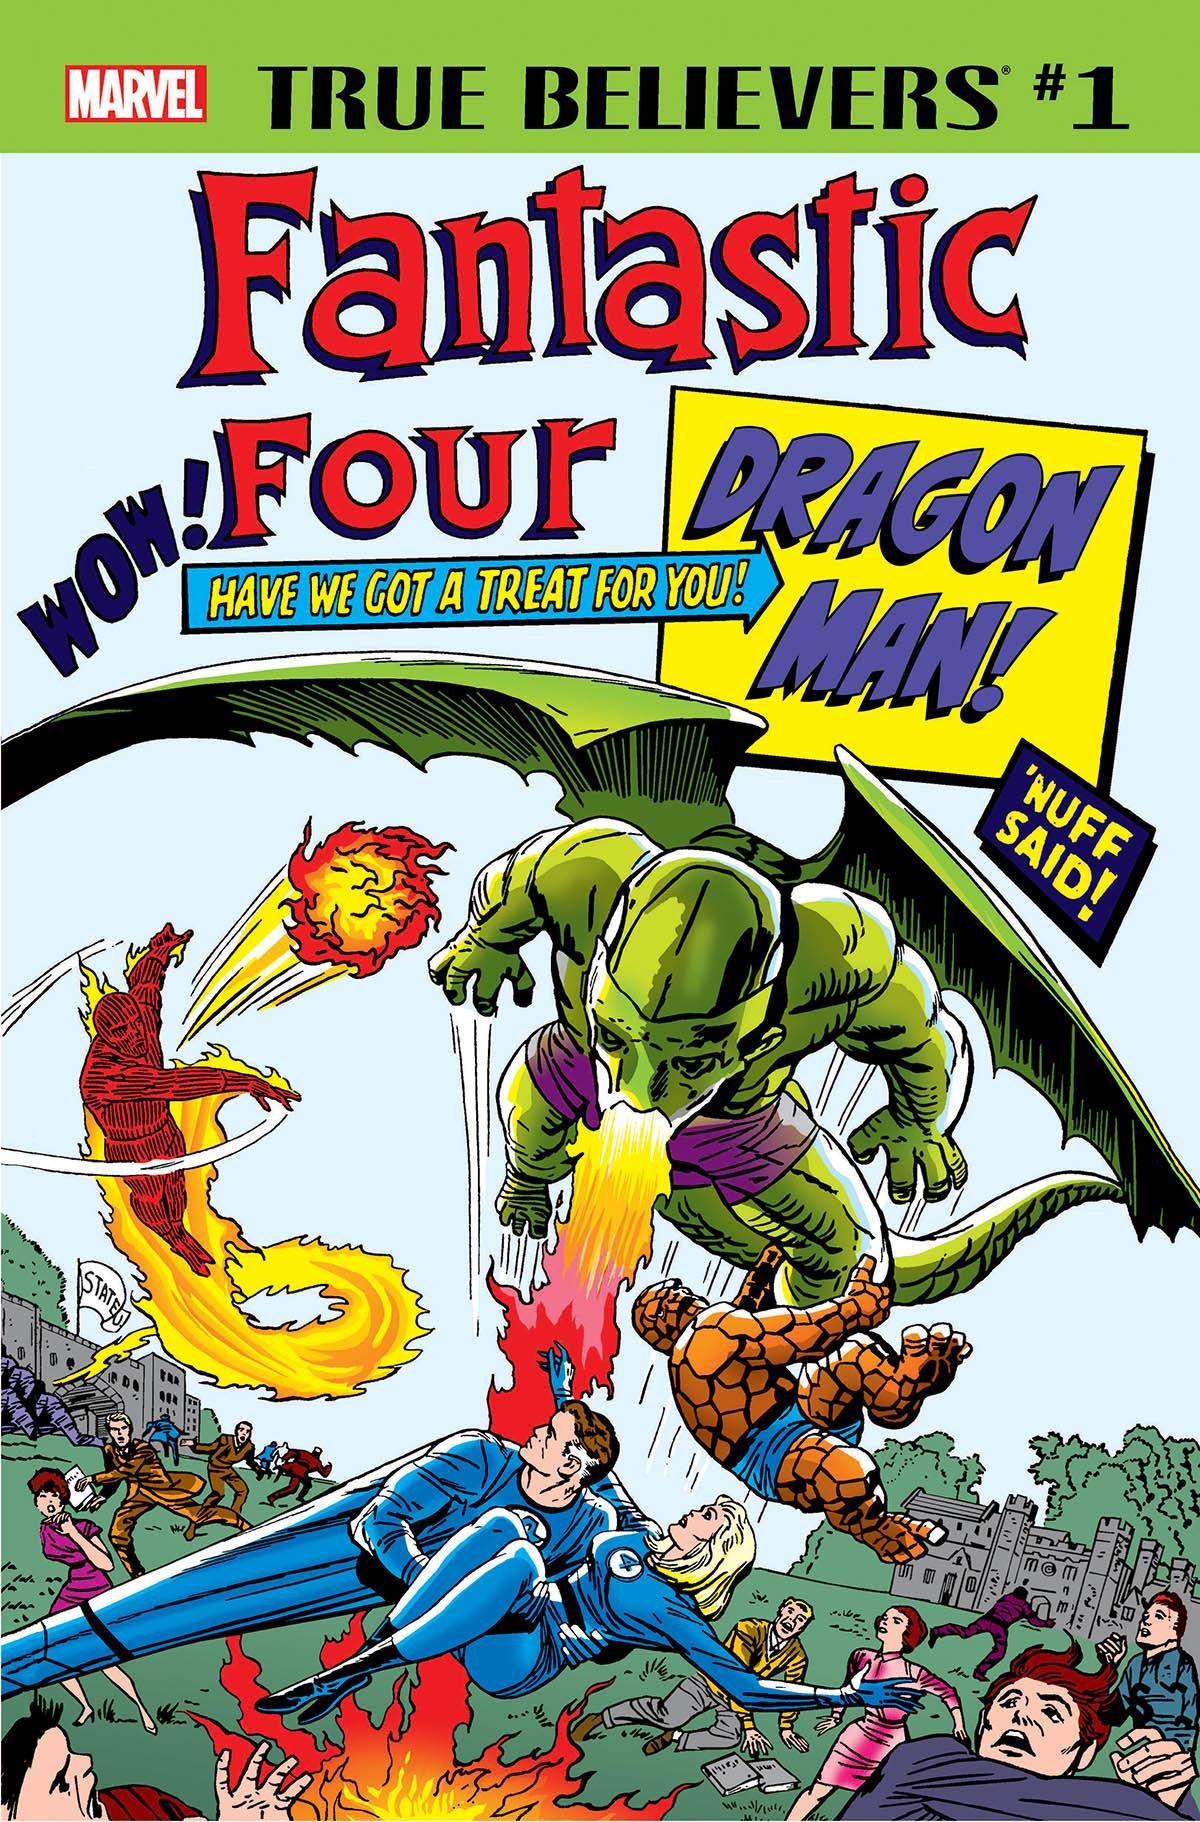 True Believers: Fantastic Four - Dragon Man Vol 1 1